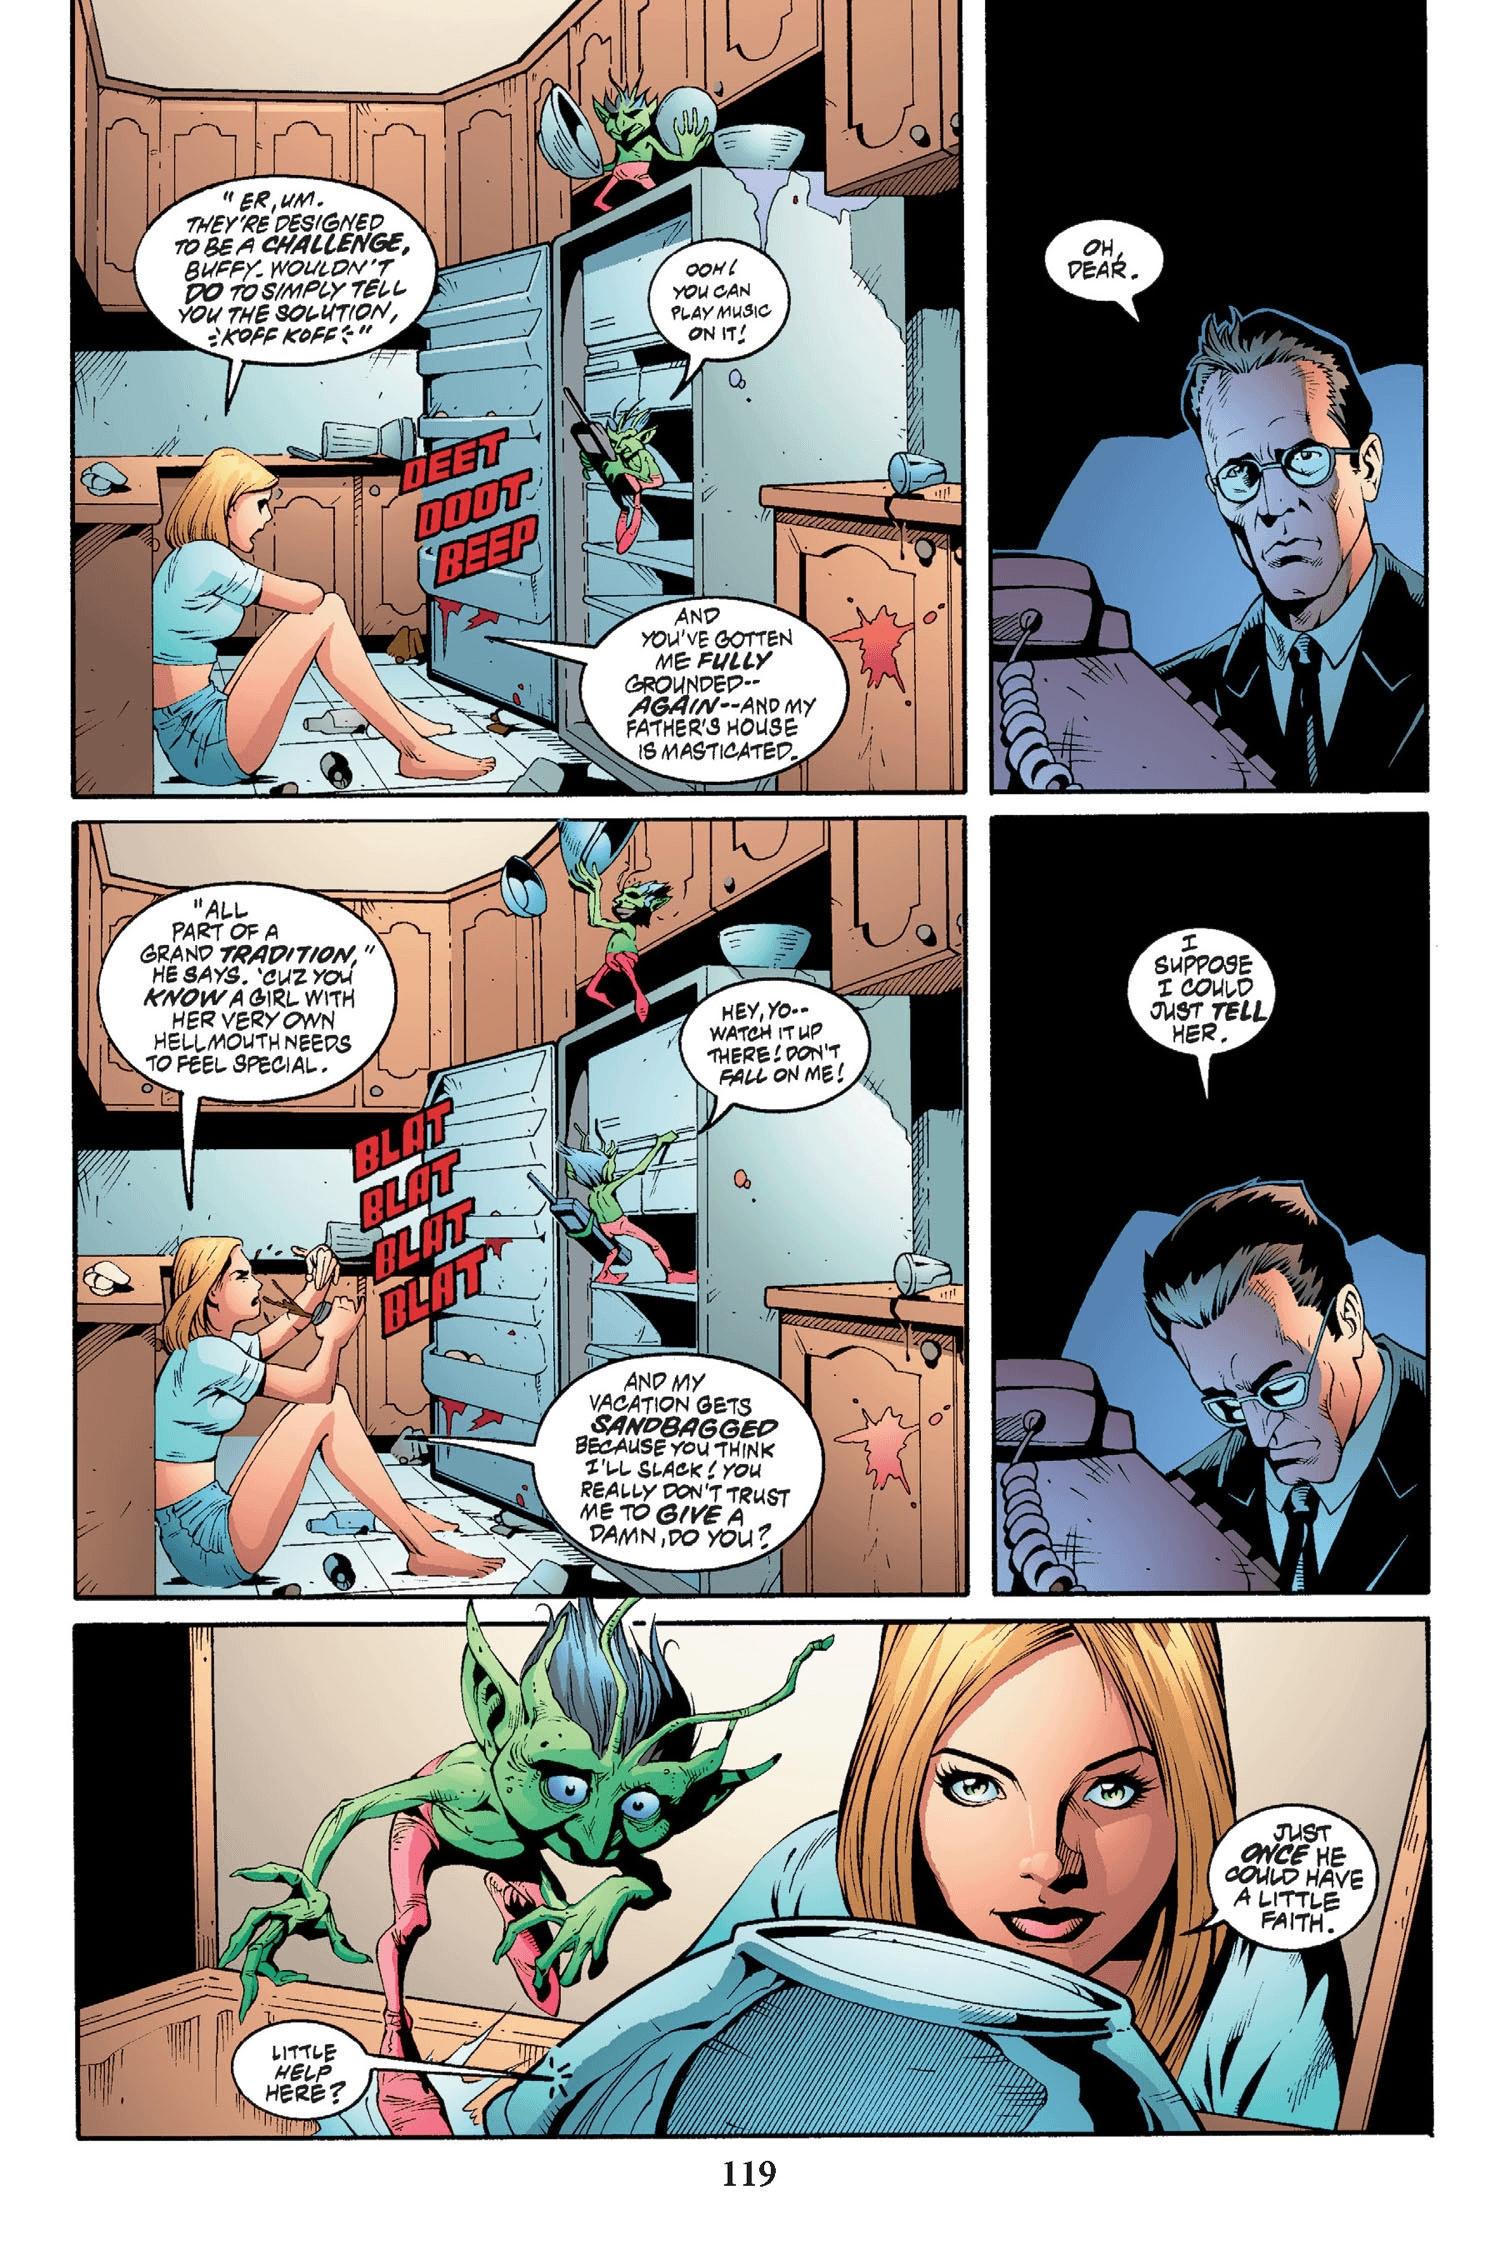 Read online Buffy the Vampire Slayer: Omnibus comic -  Issue # TPB 2 - 114